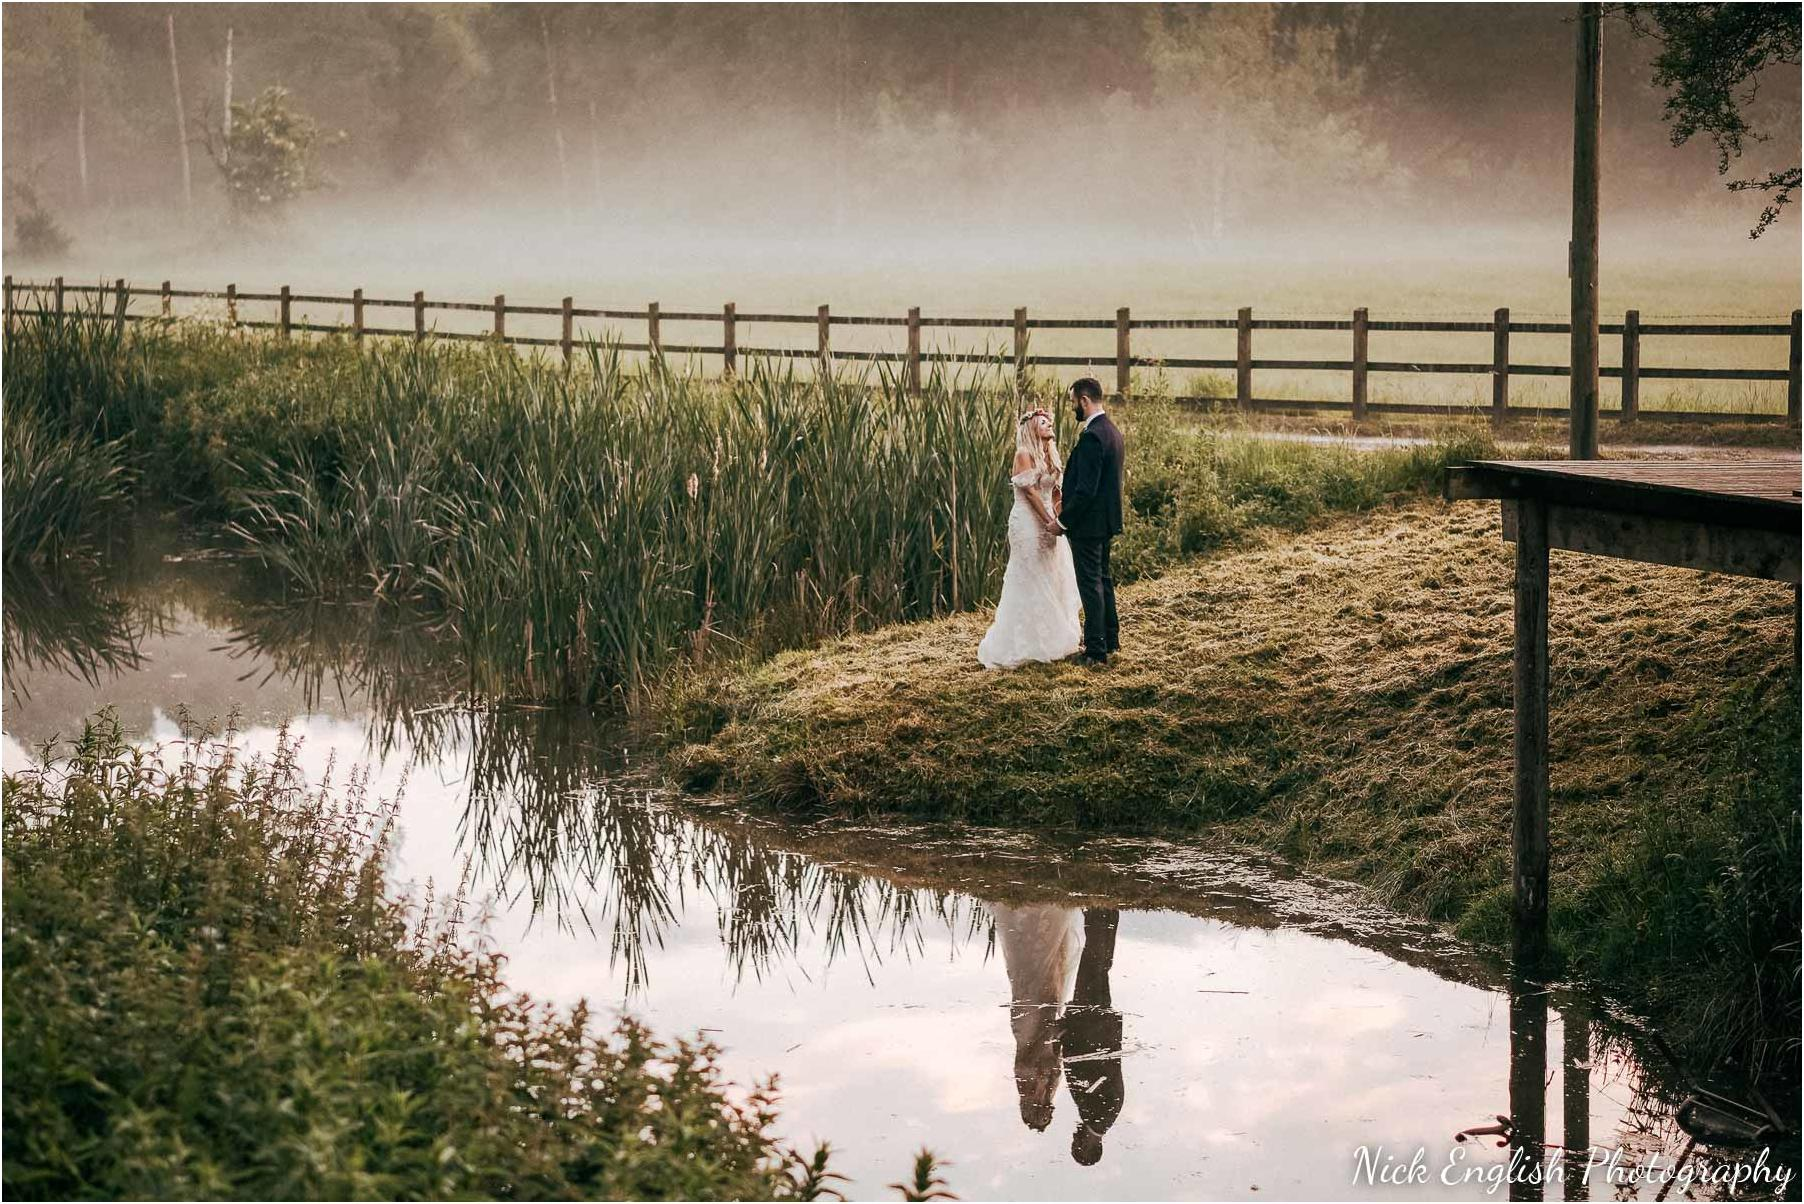 Whitebottom_Farm_Wedding_Manchester_Photograph-142.jpg